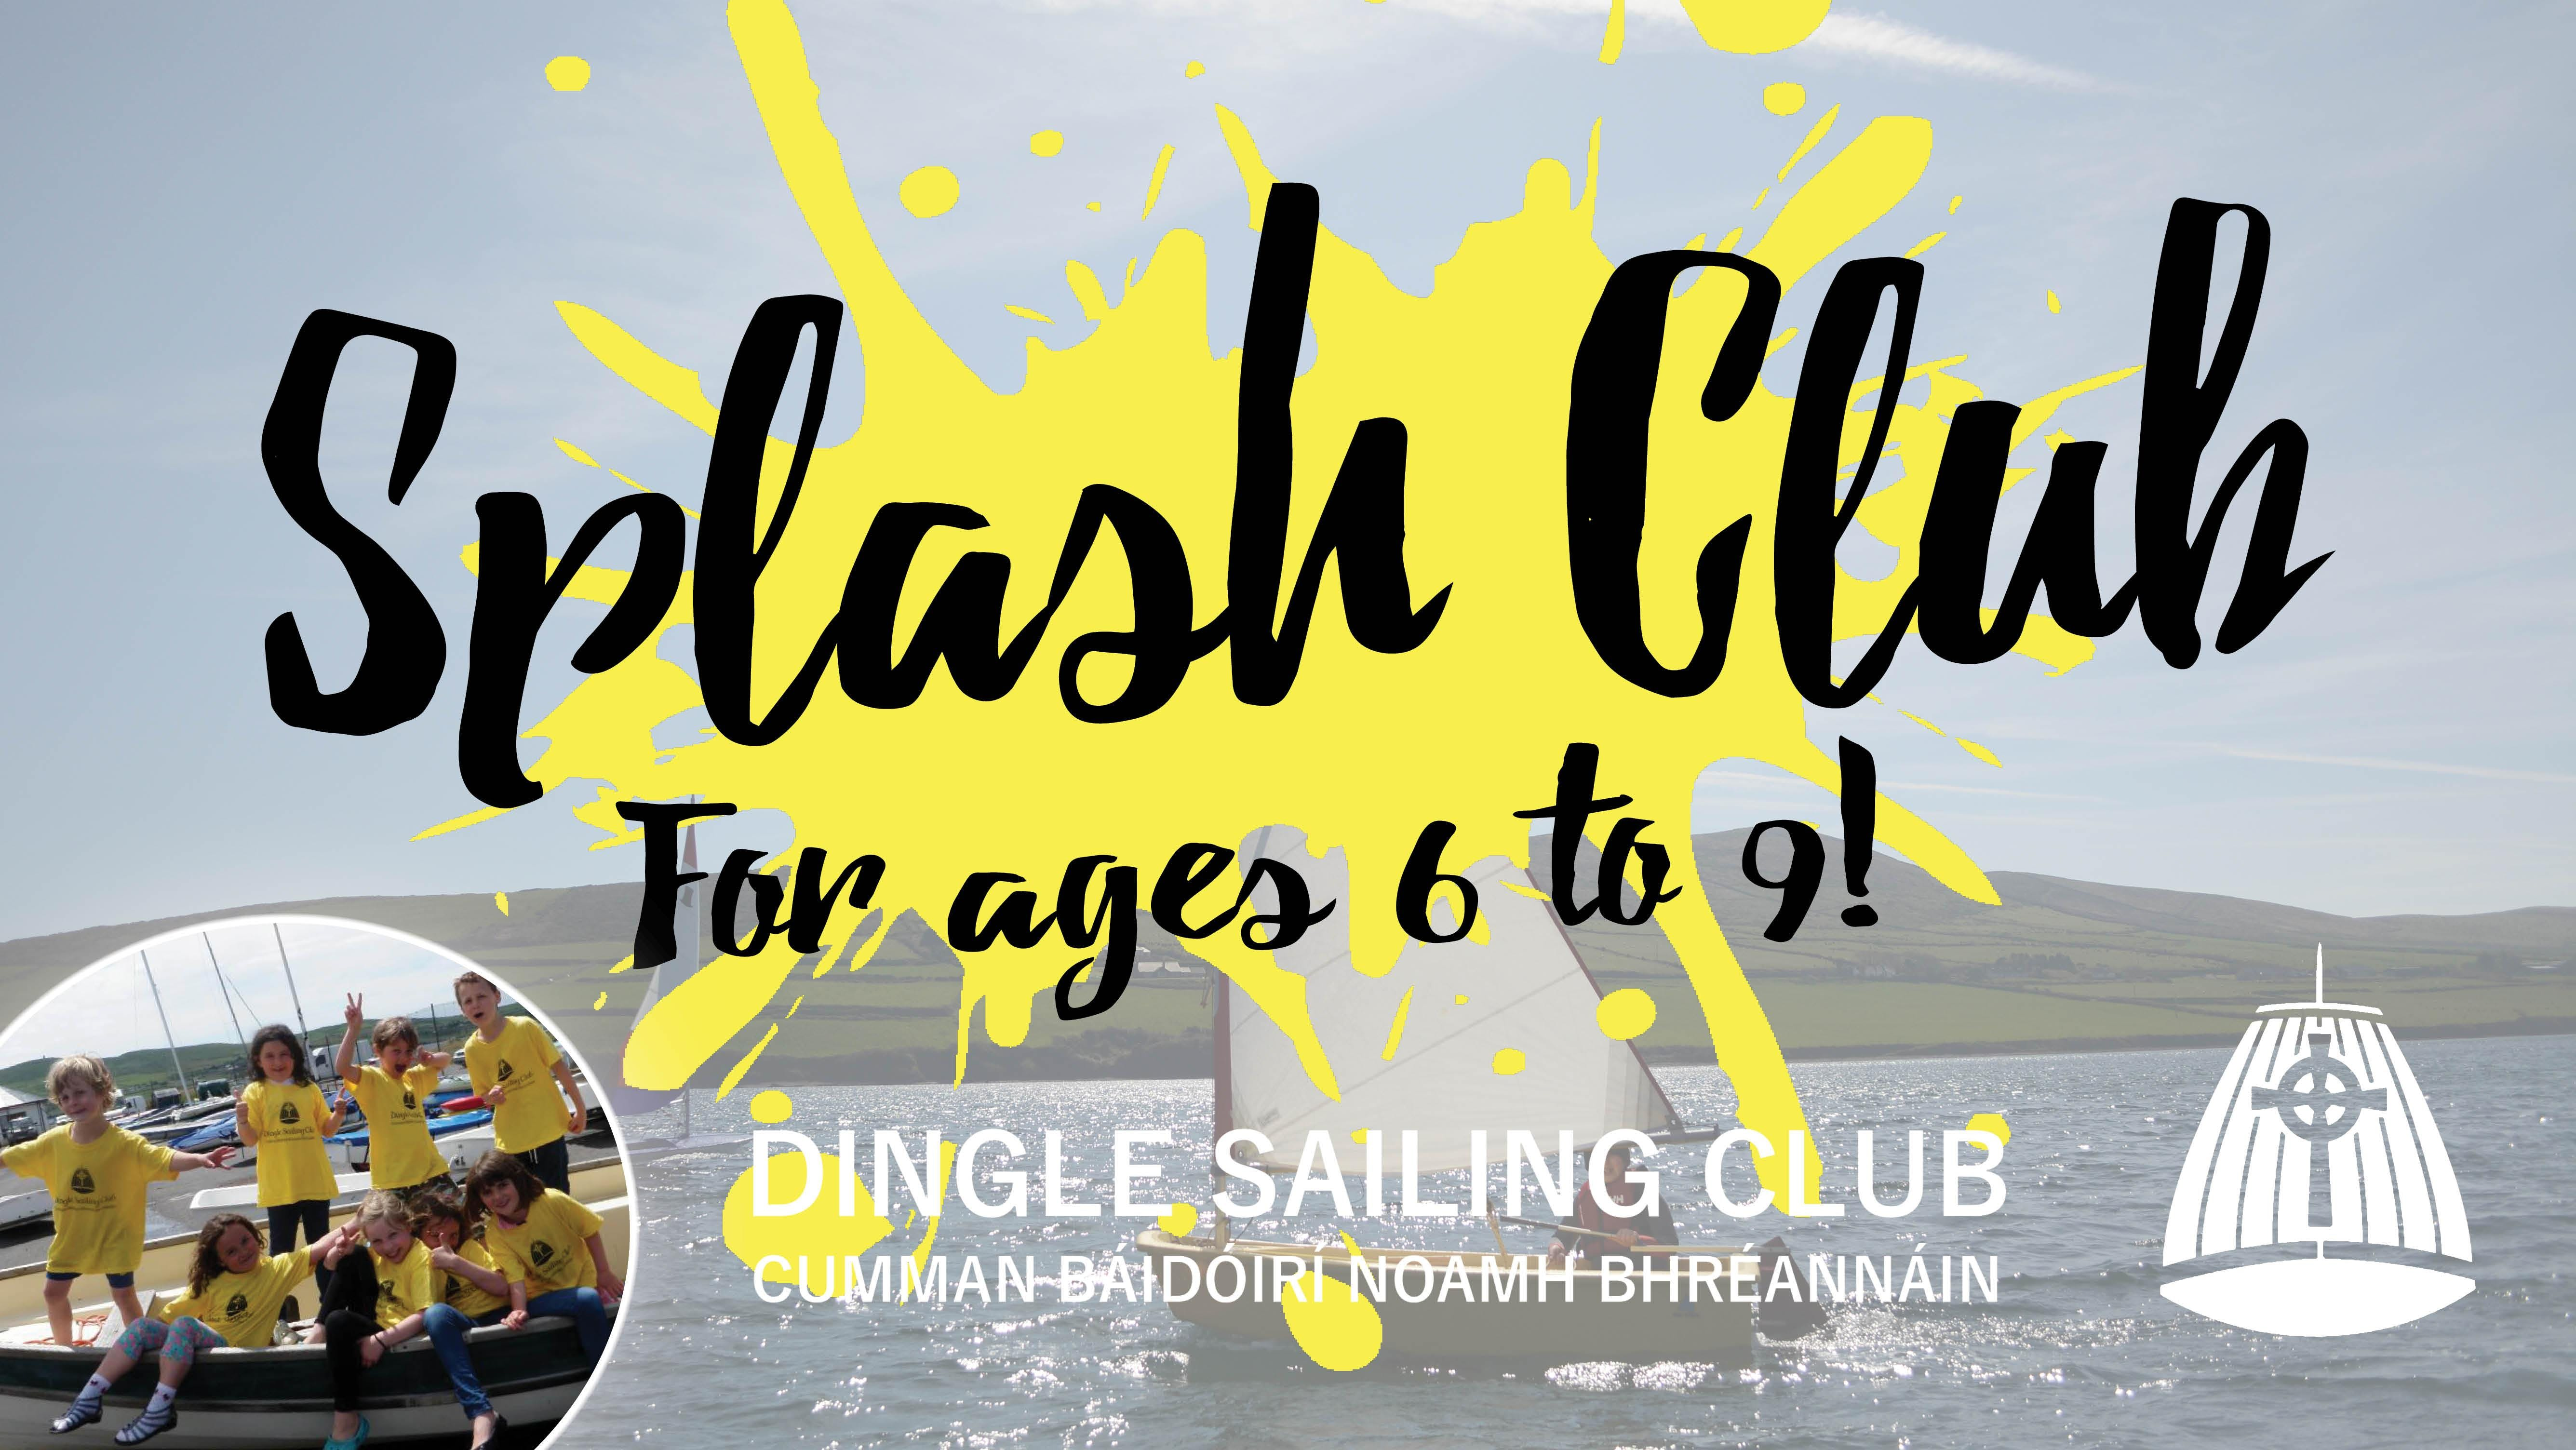 Splash Club